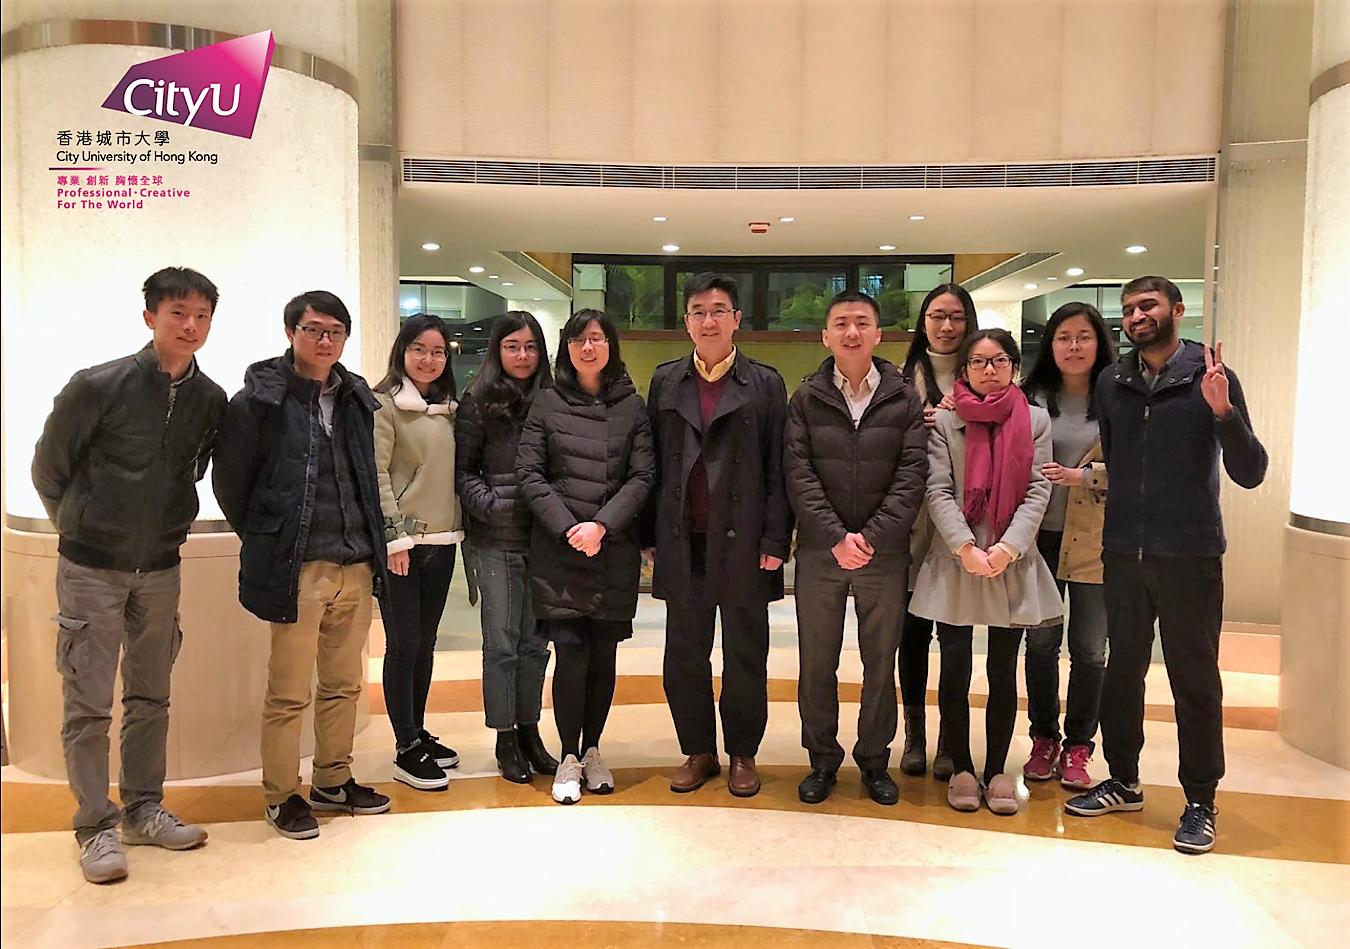 Prof. Xun-Li Wang and the research team took photo at CityU